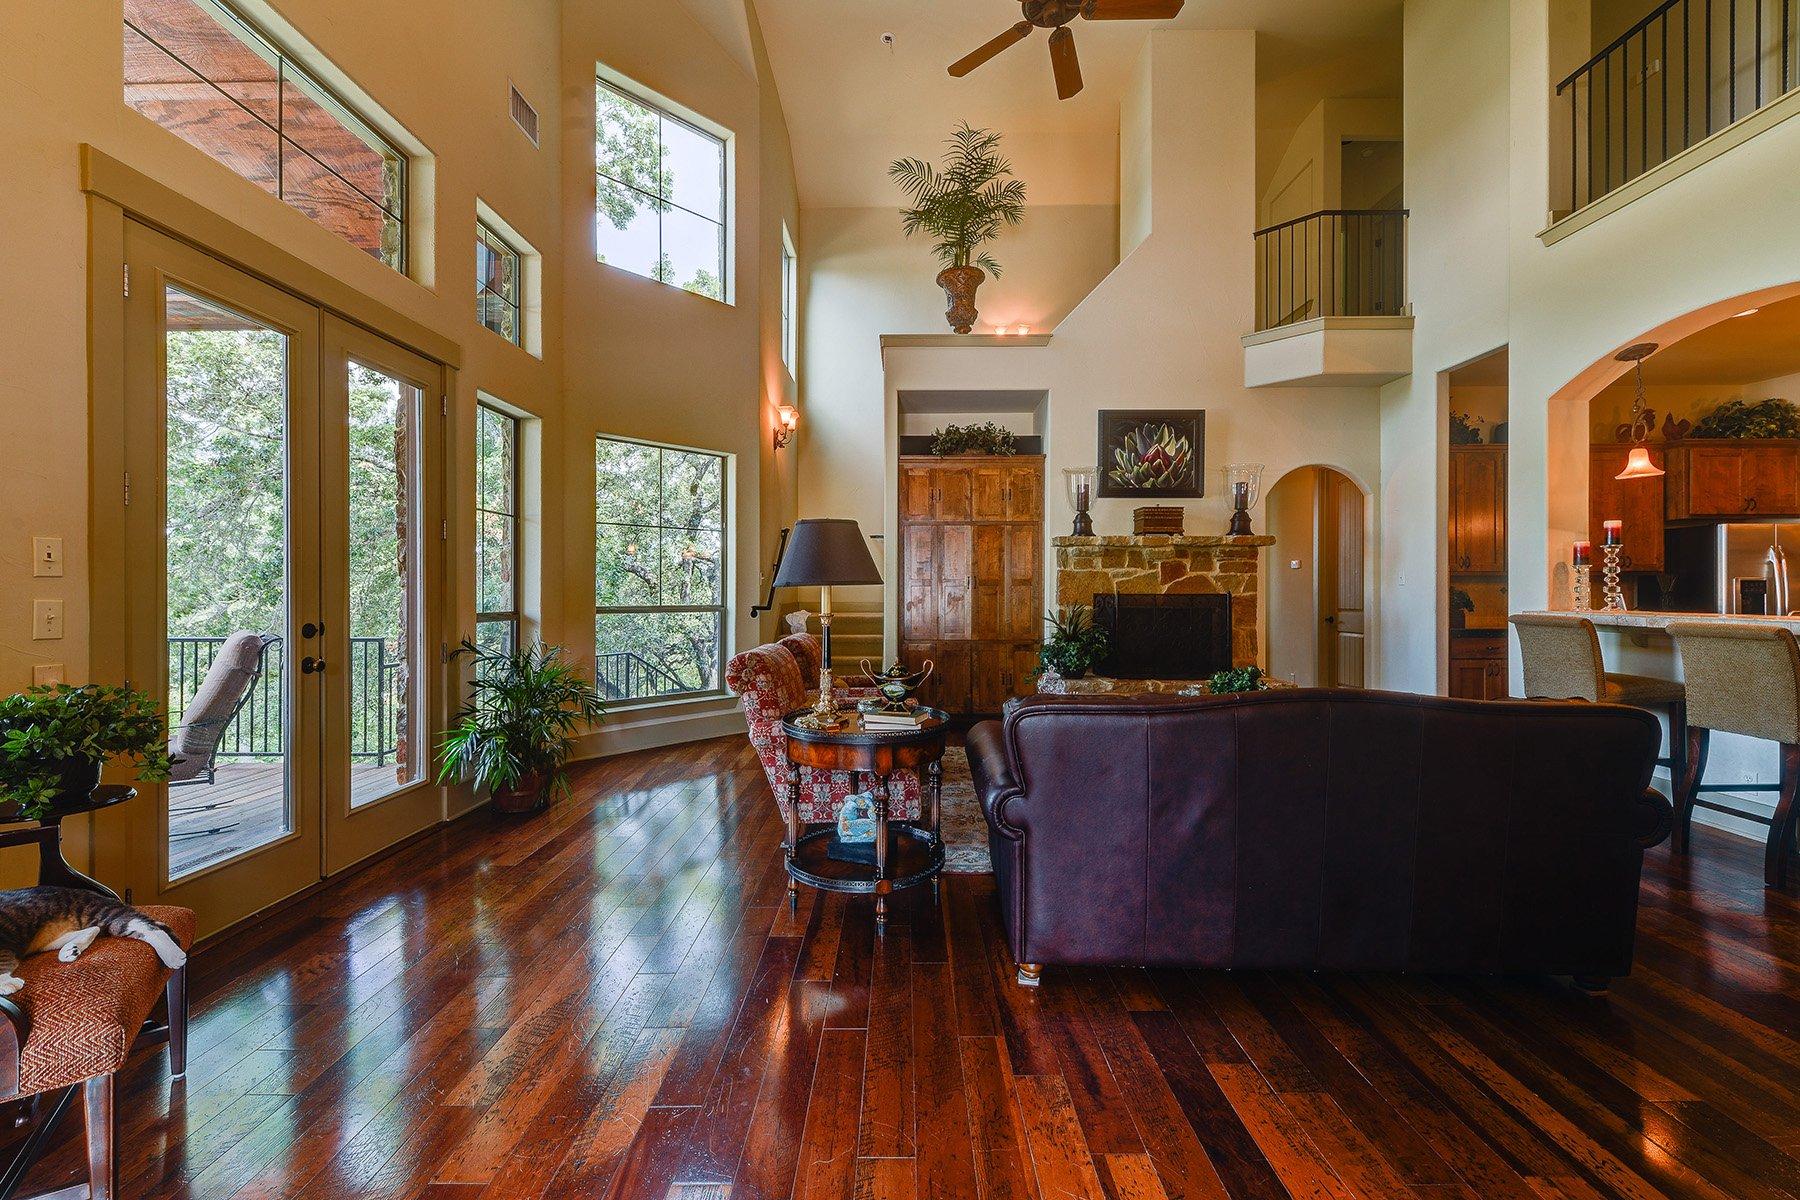 Keith Falcone REMAX Lake Travis Real Estate